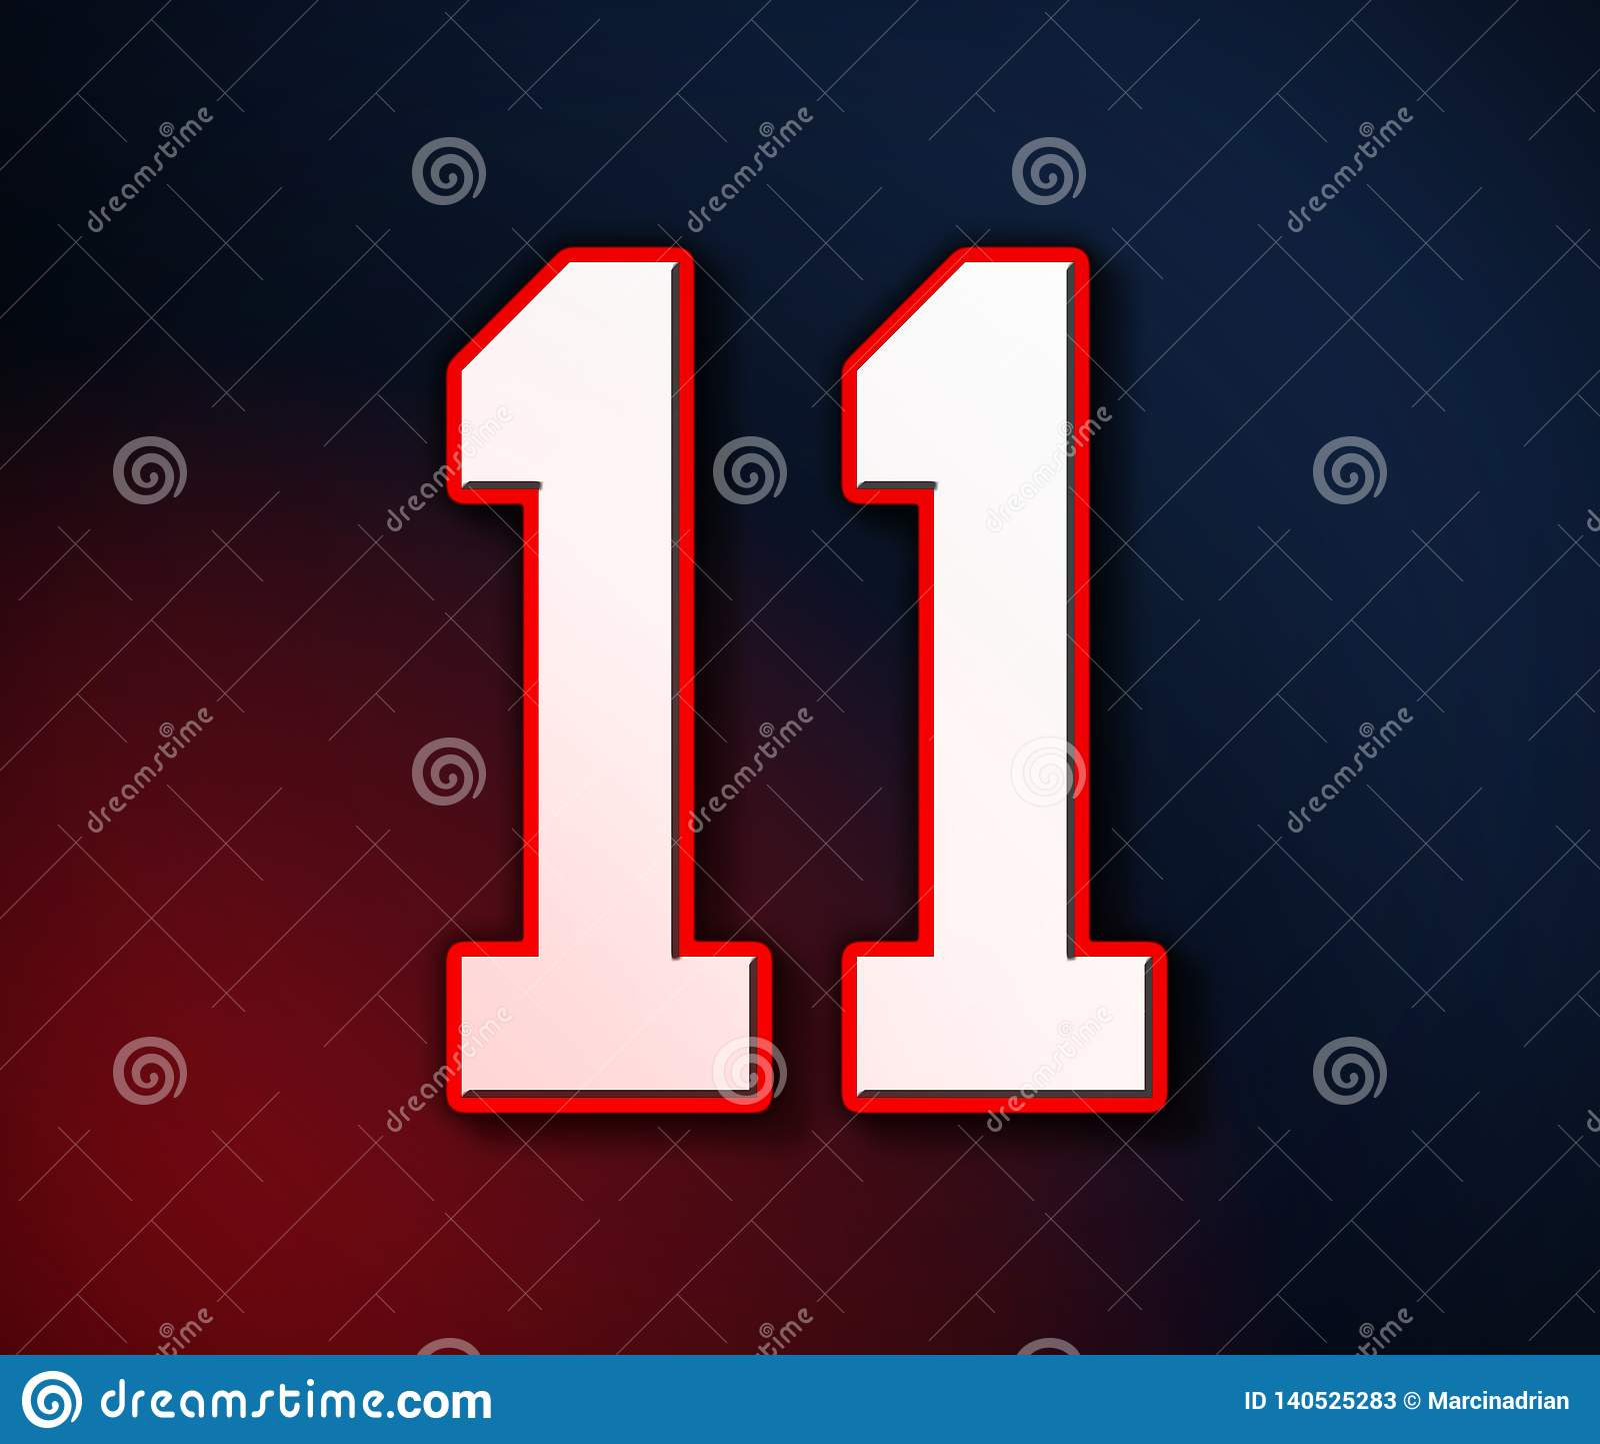 patriots jersey number 11